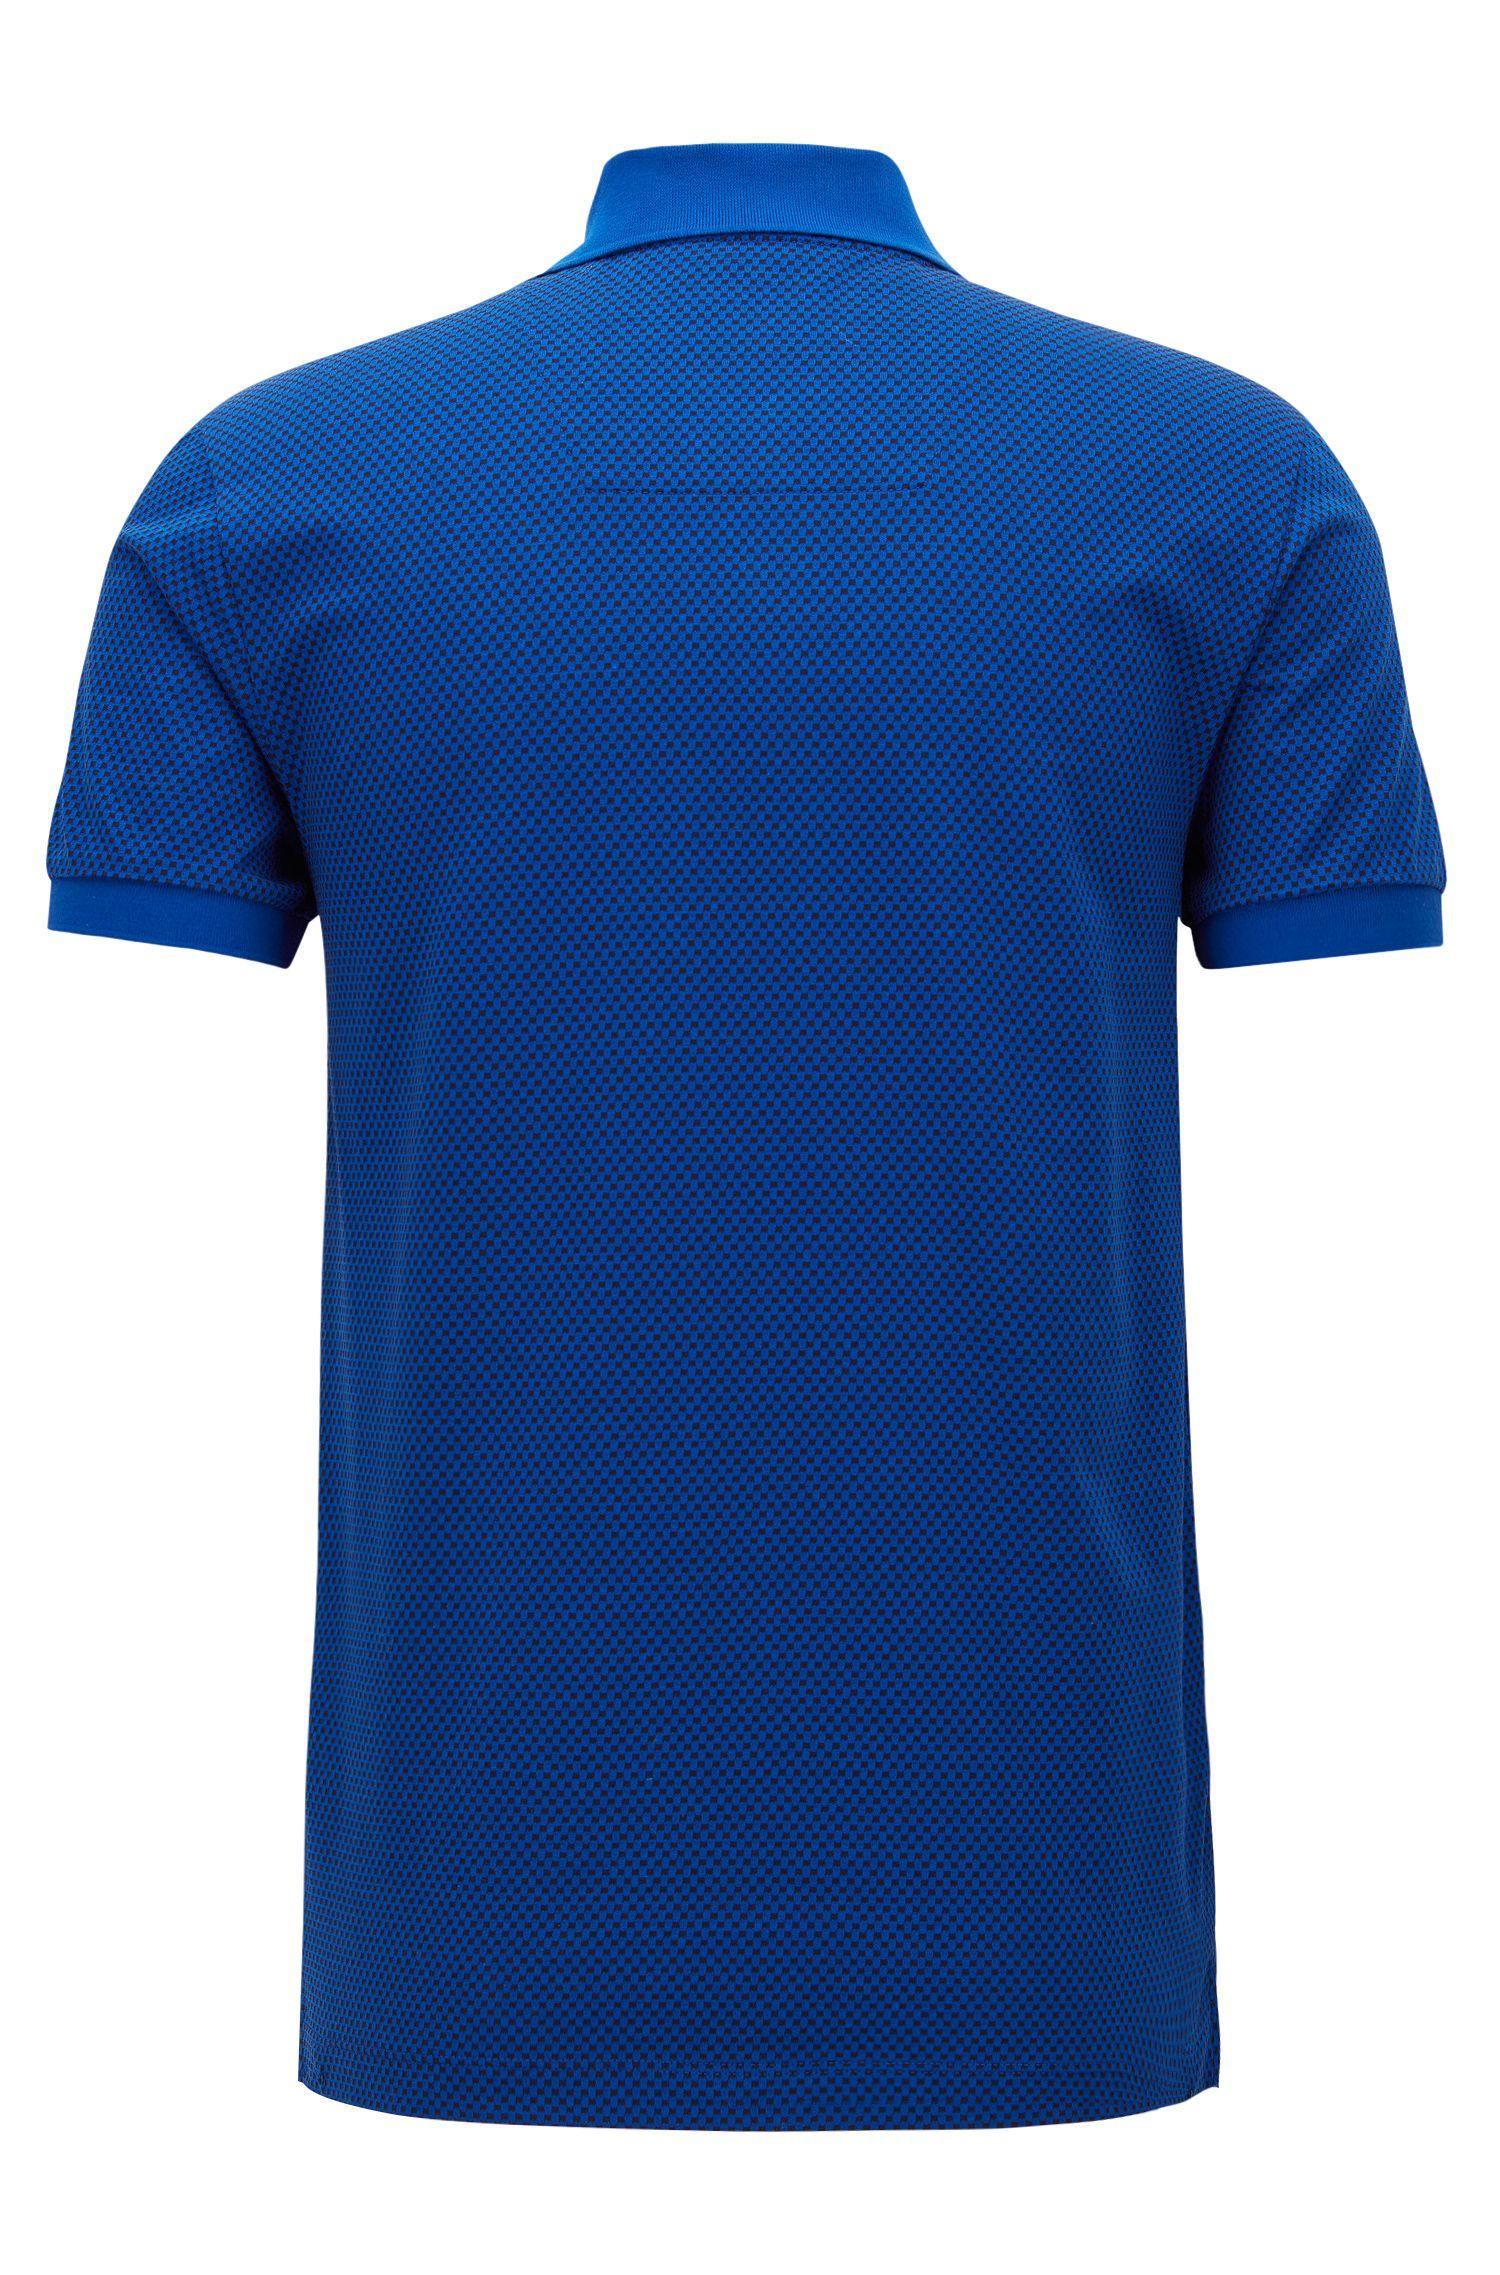 Micro-Print Cotton Polo Shirt, Slim Fit | Phillipson, Open Blue